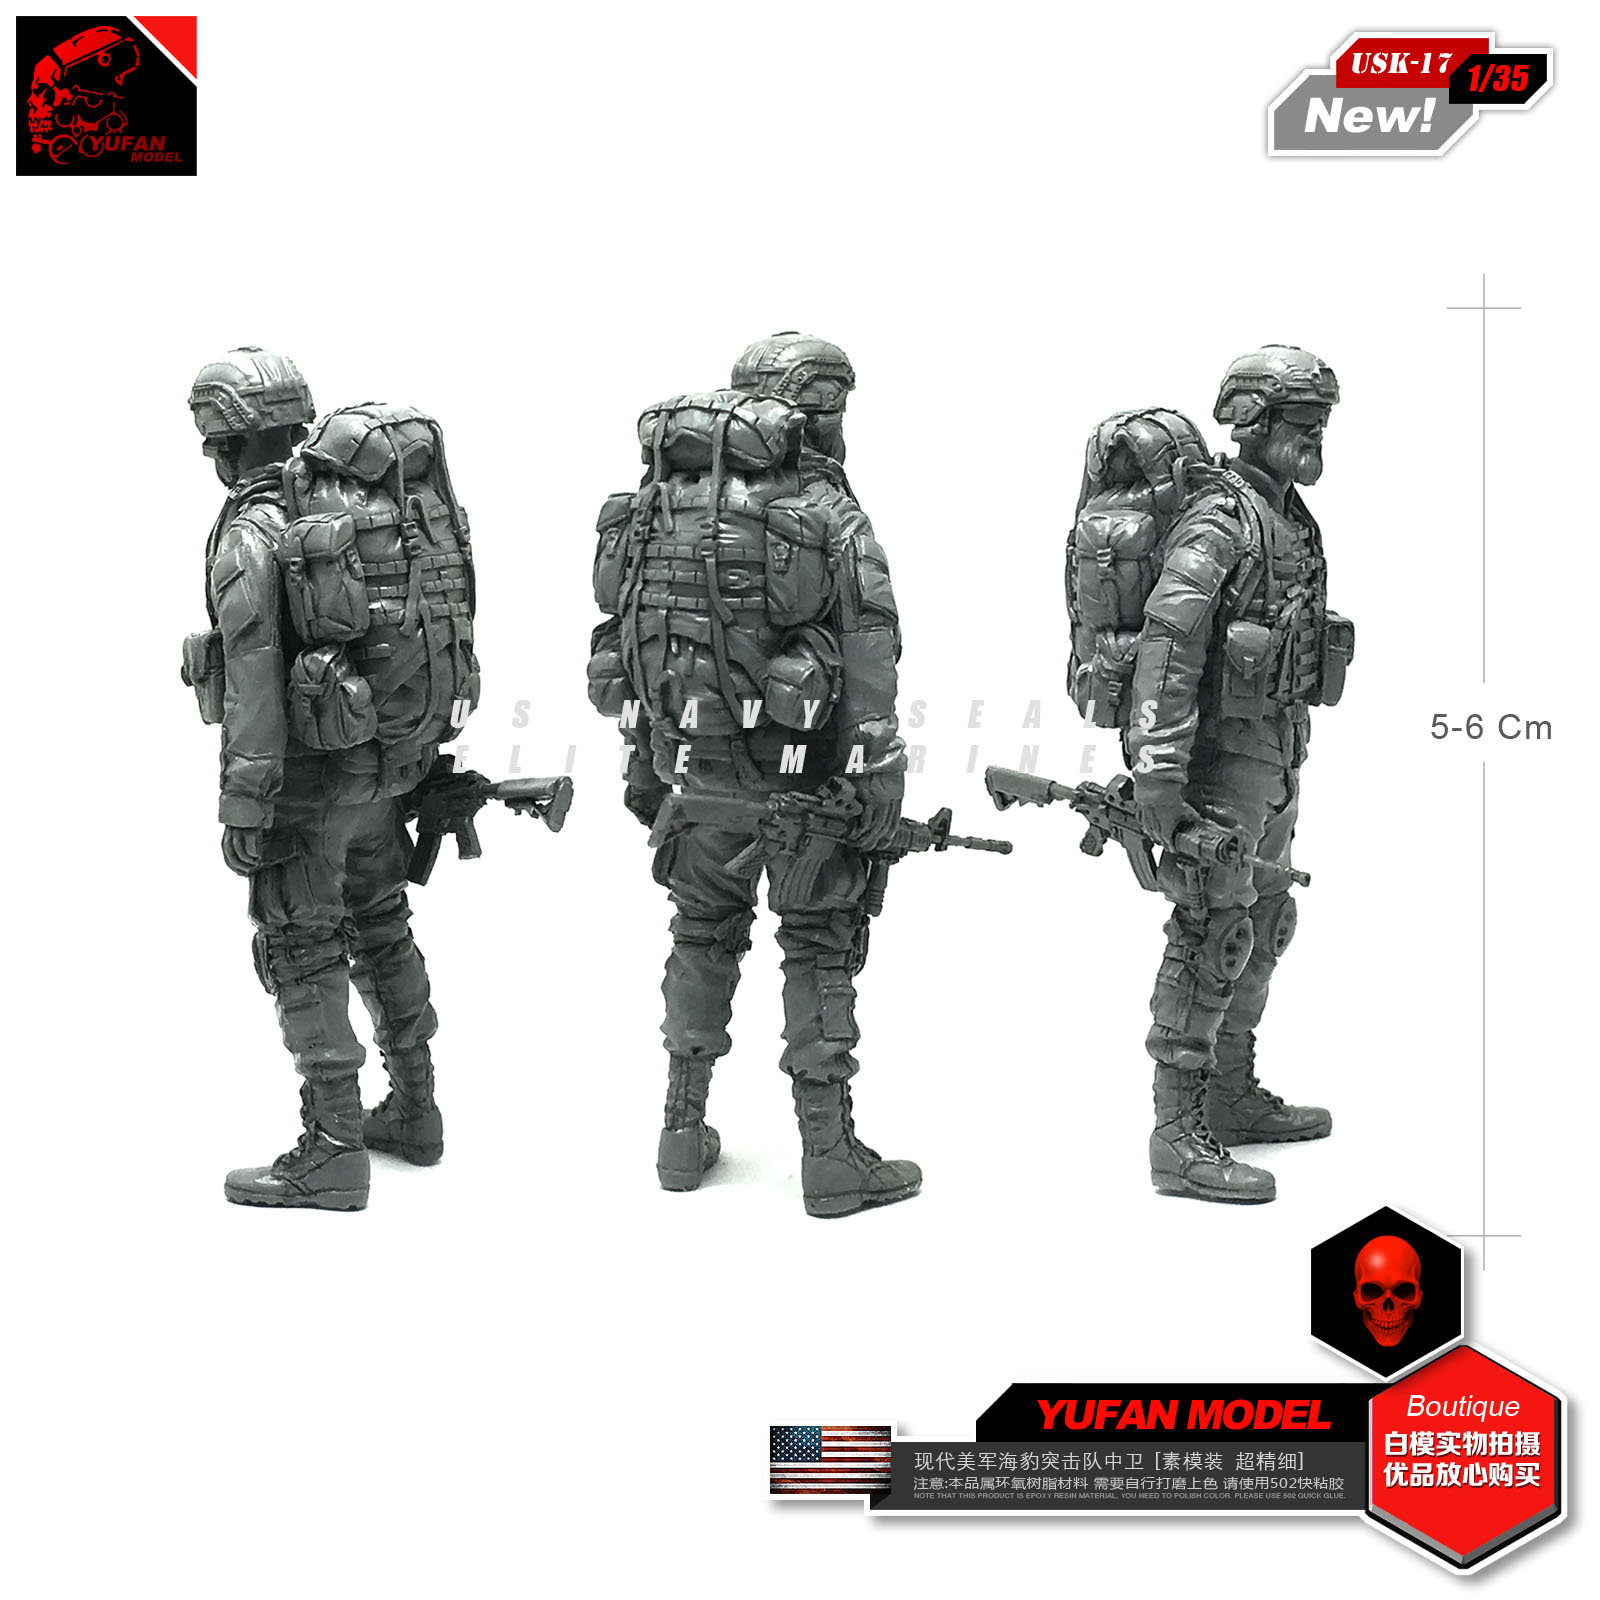 1//35 Epoxidharz Soldat Modell 5cm Gepanzerte Soldat Modell Y6Y1 Static Mont X6N7